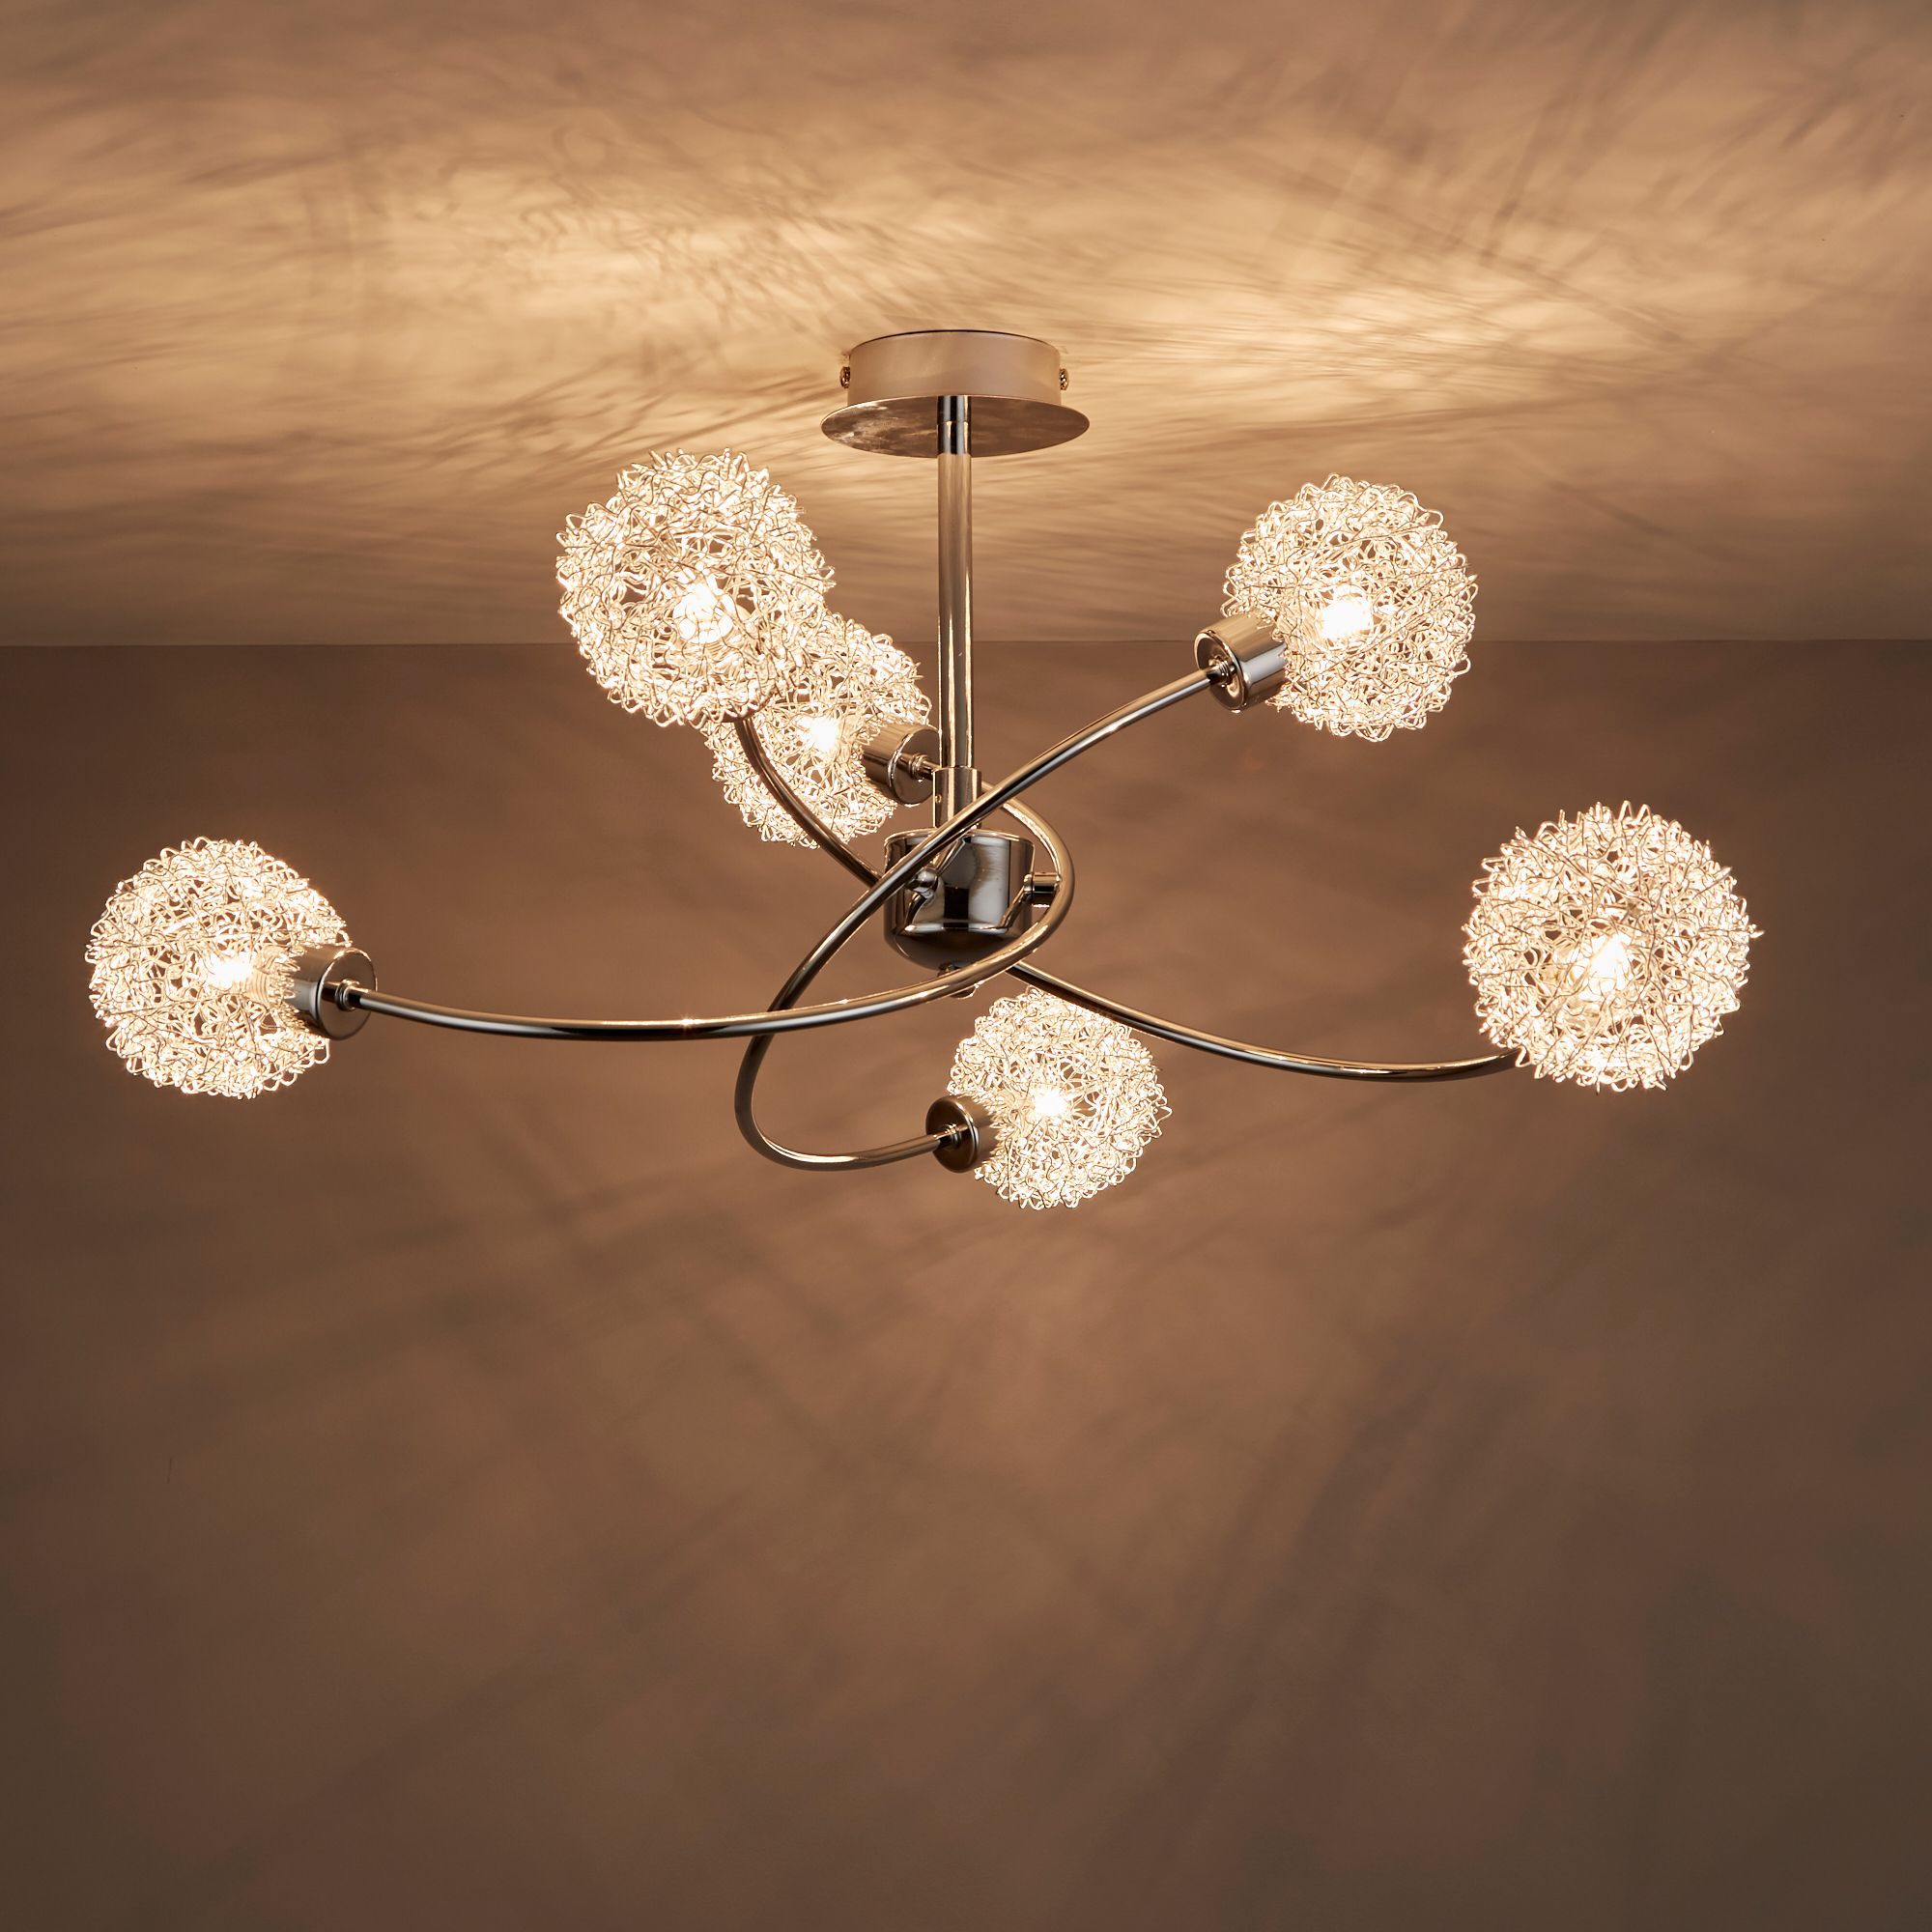 Caelus Chrome Effect 6 Lamp Ceiling Light